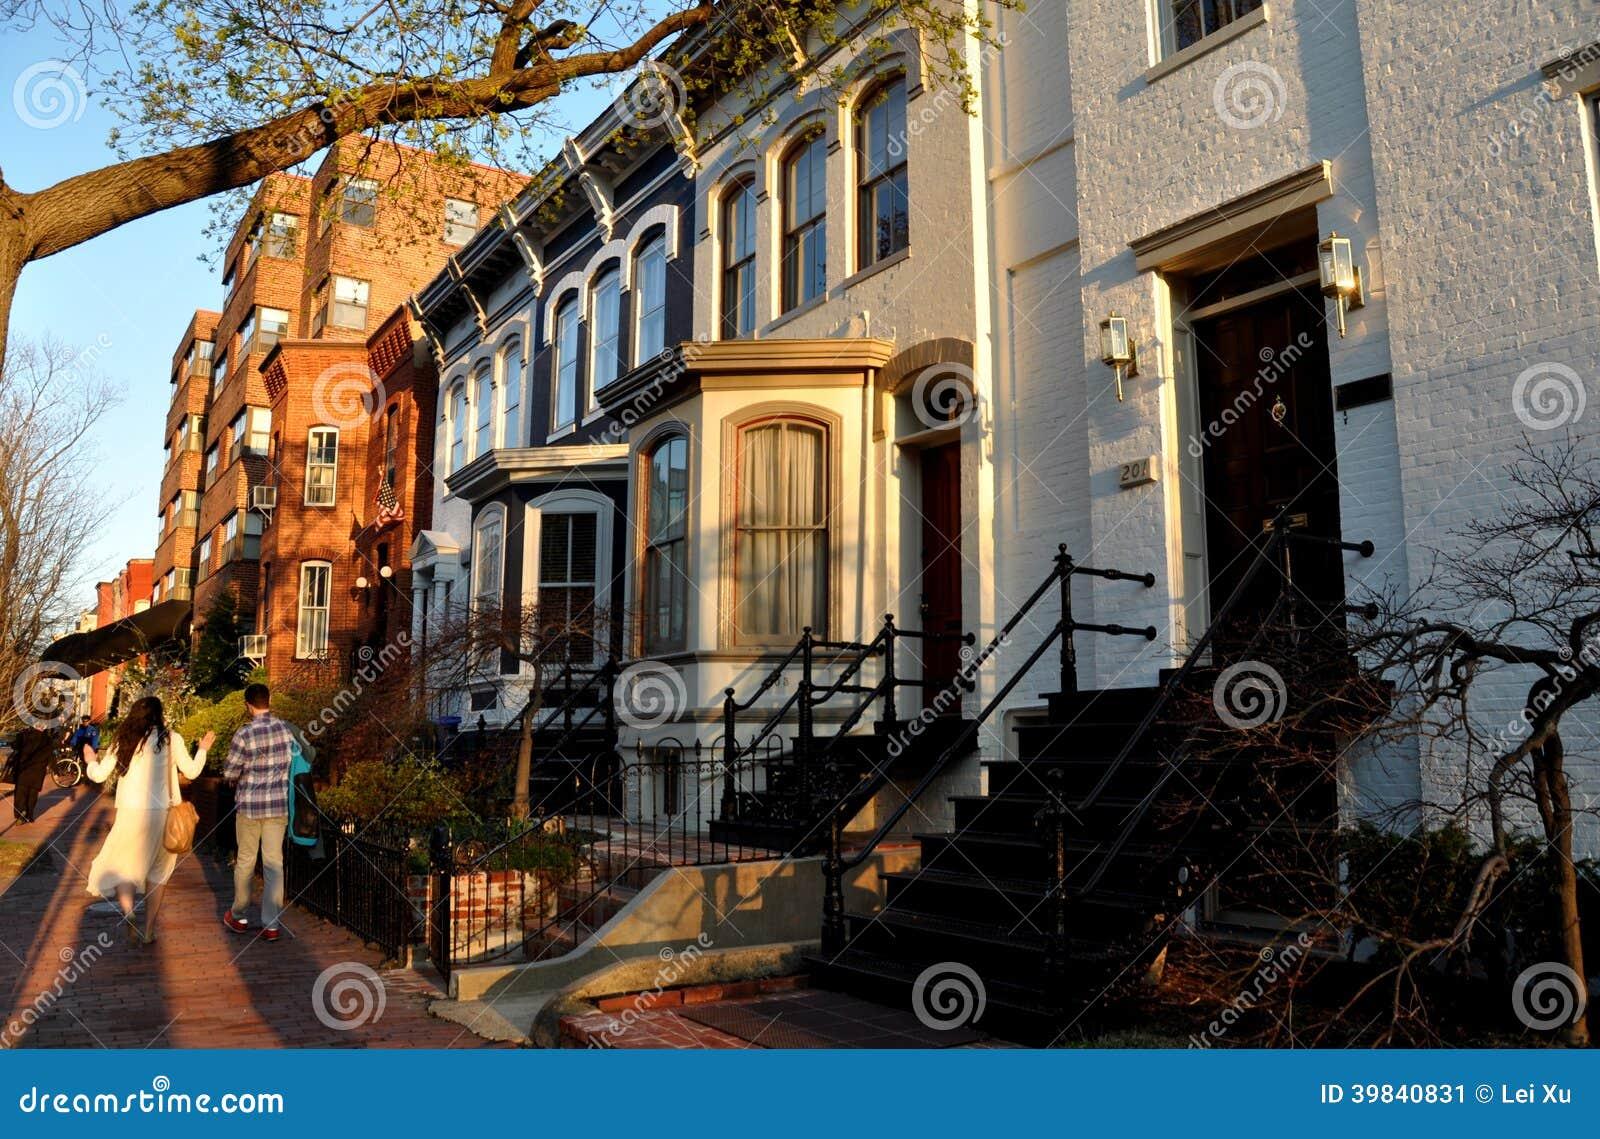 Street Of Dreams Homes Washington